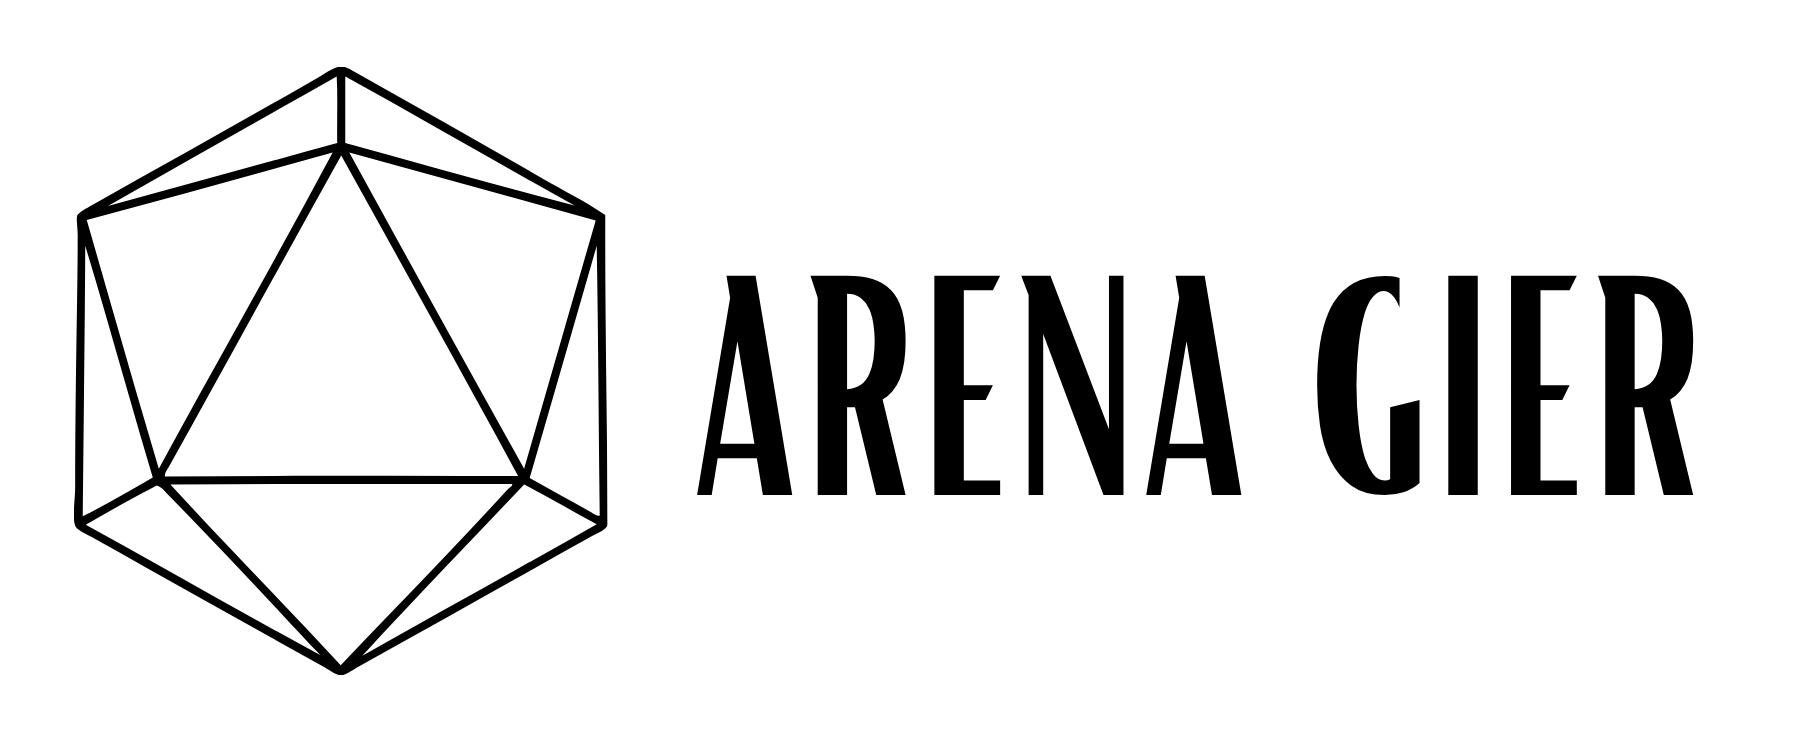 Arena Gier ed. 4.